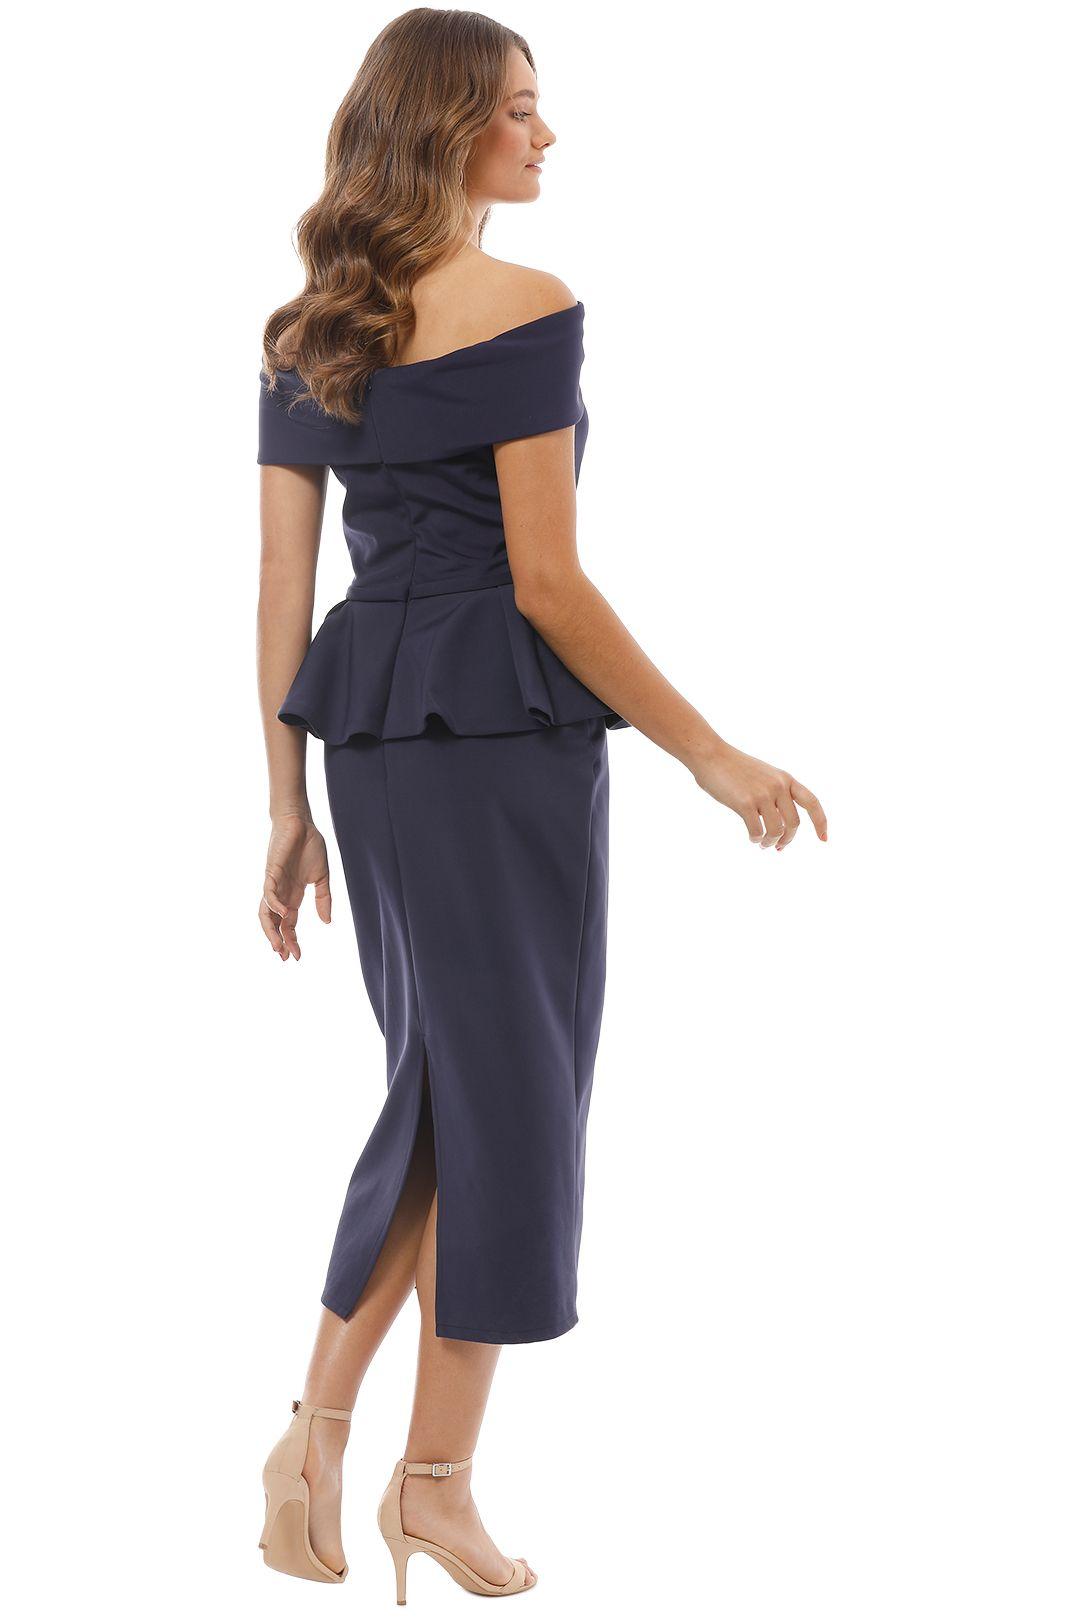 Tinaholy - Navy Off Shoulder Peplum Dress - Back